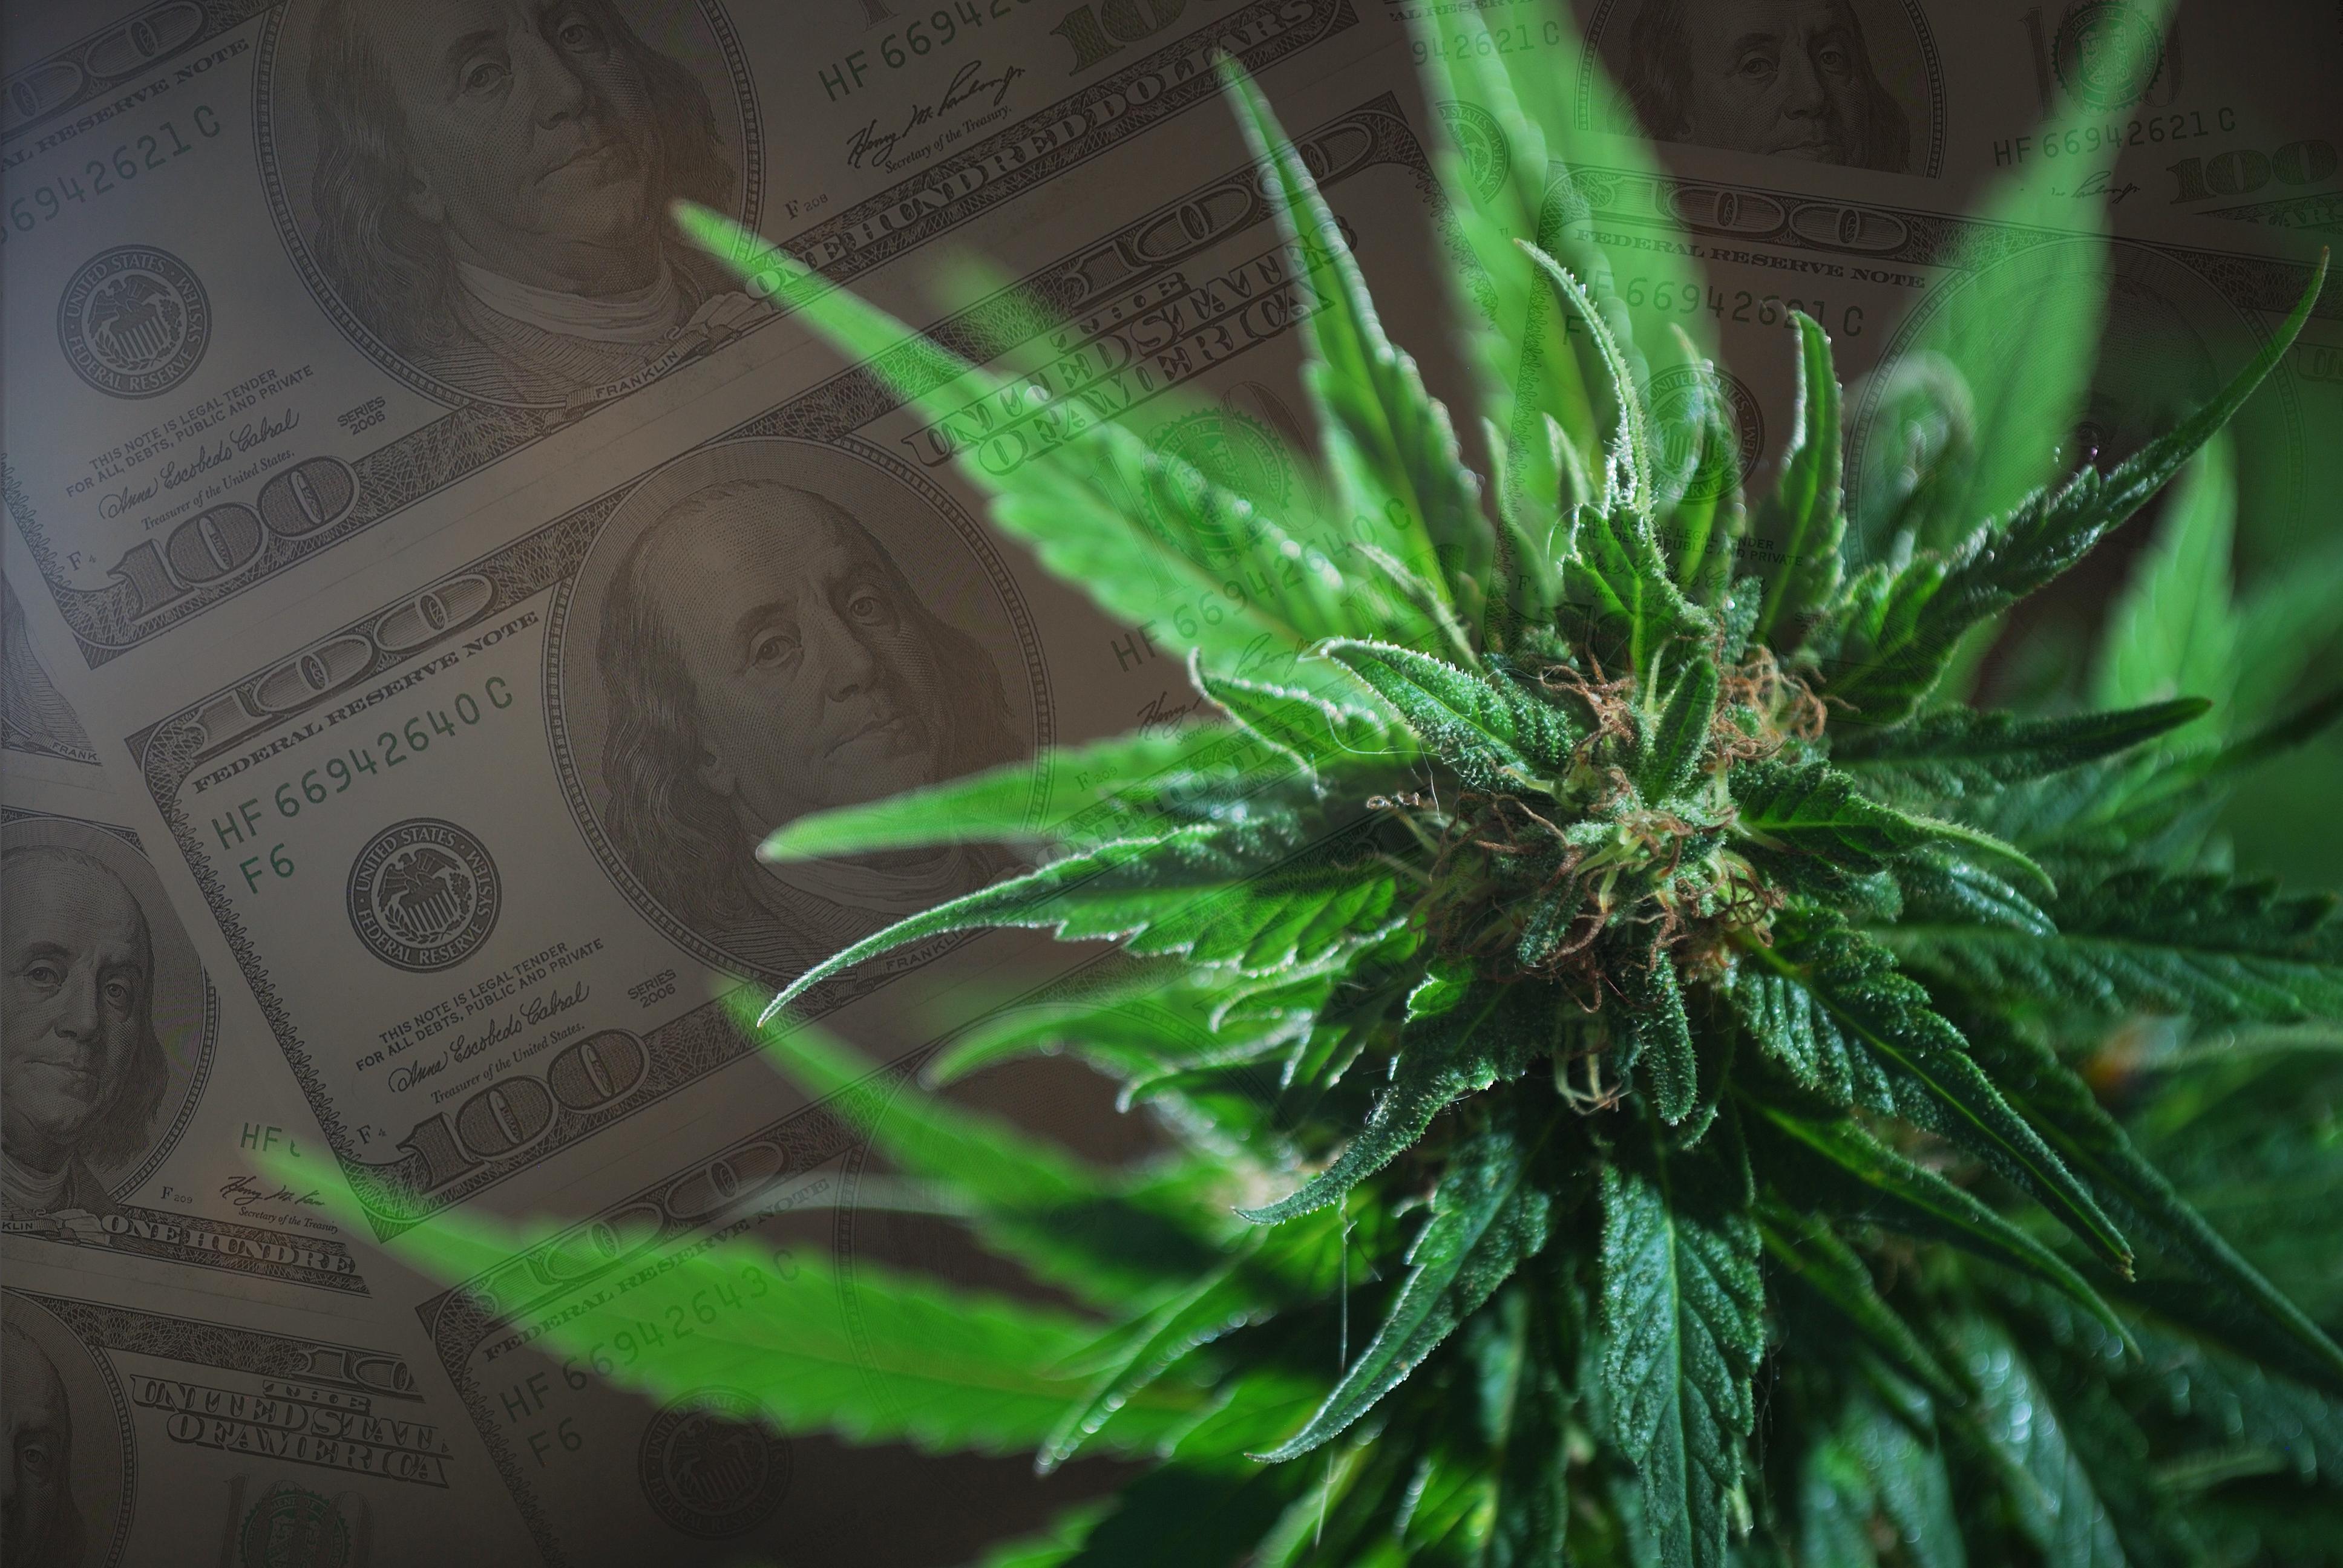 A marijuana plant on a background of $100 bills.